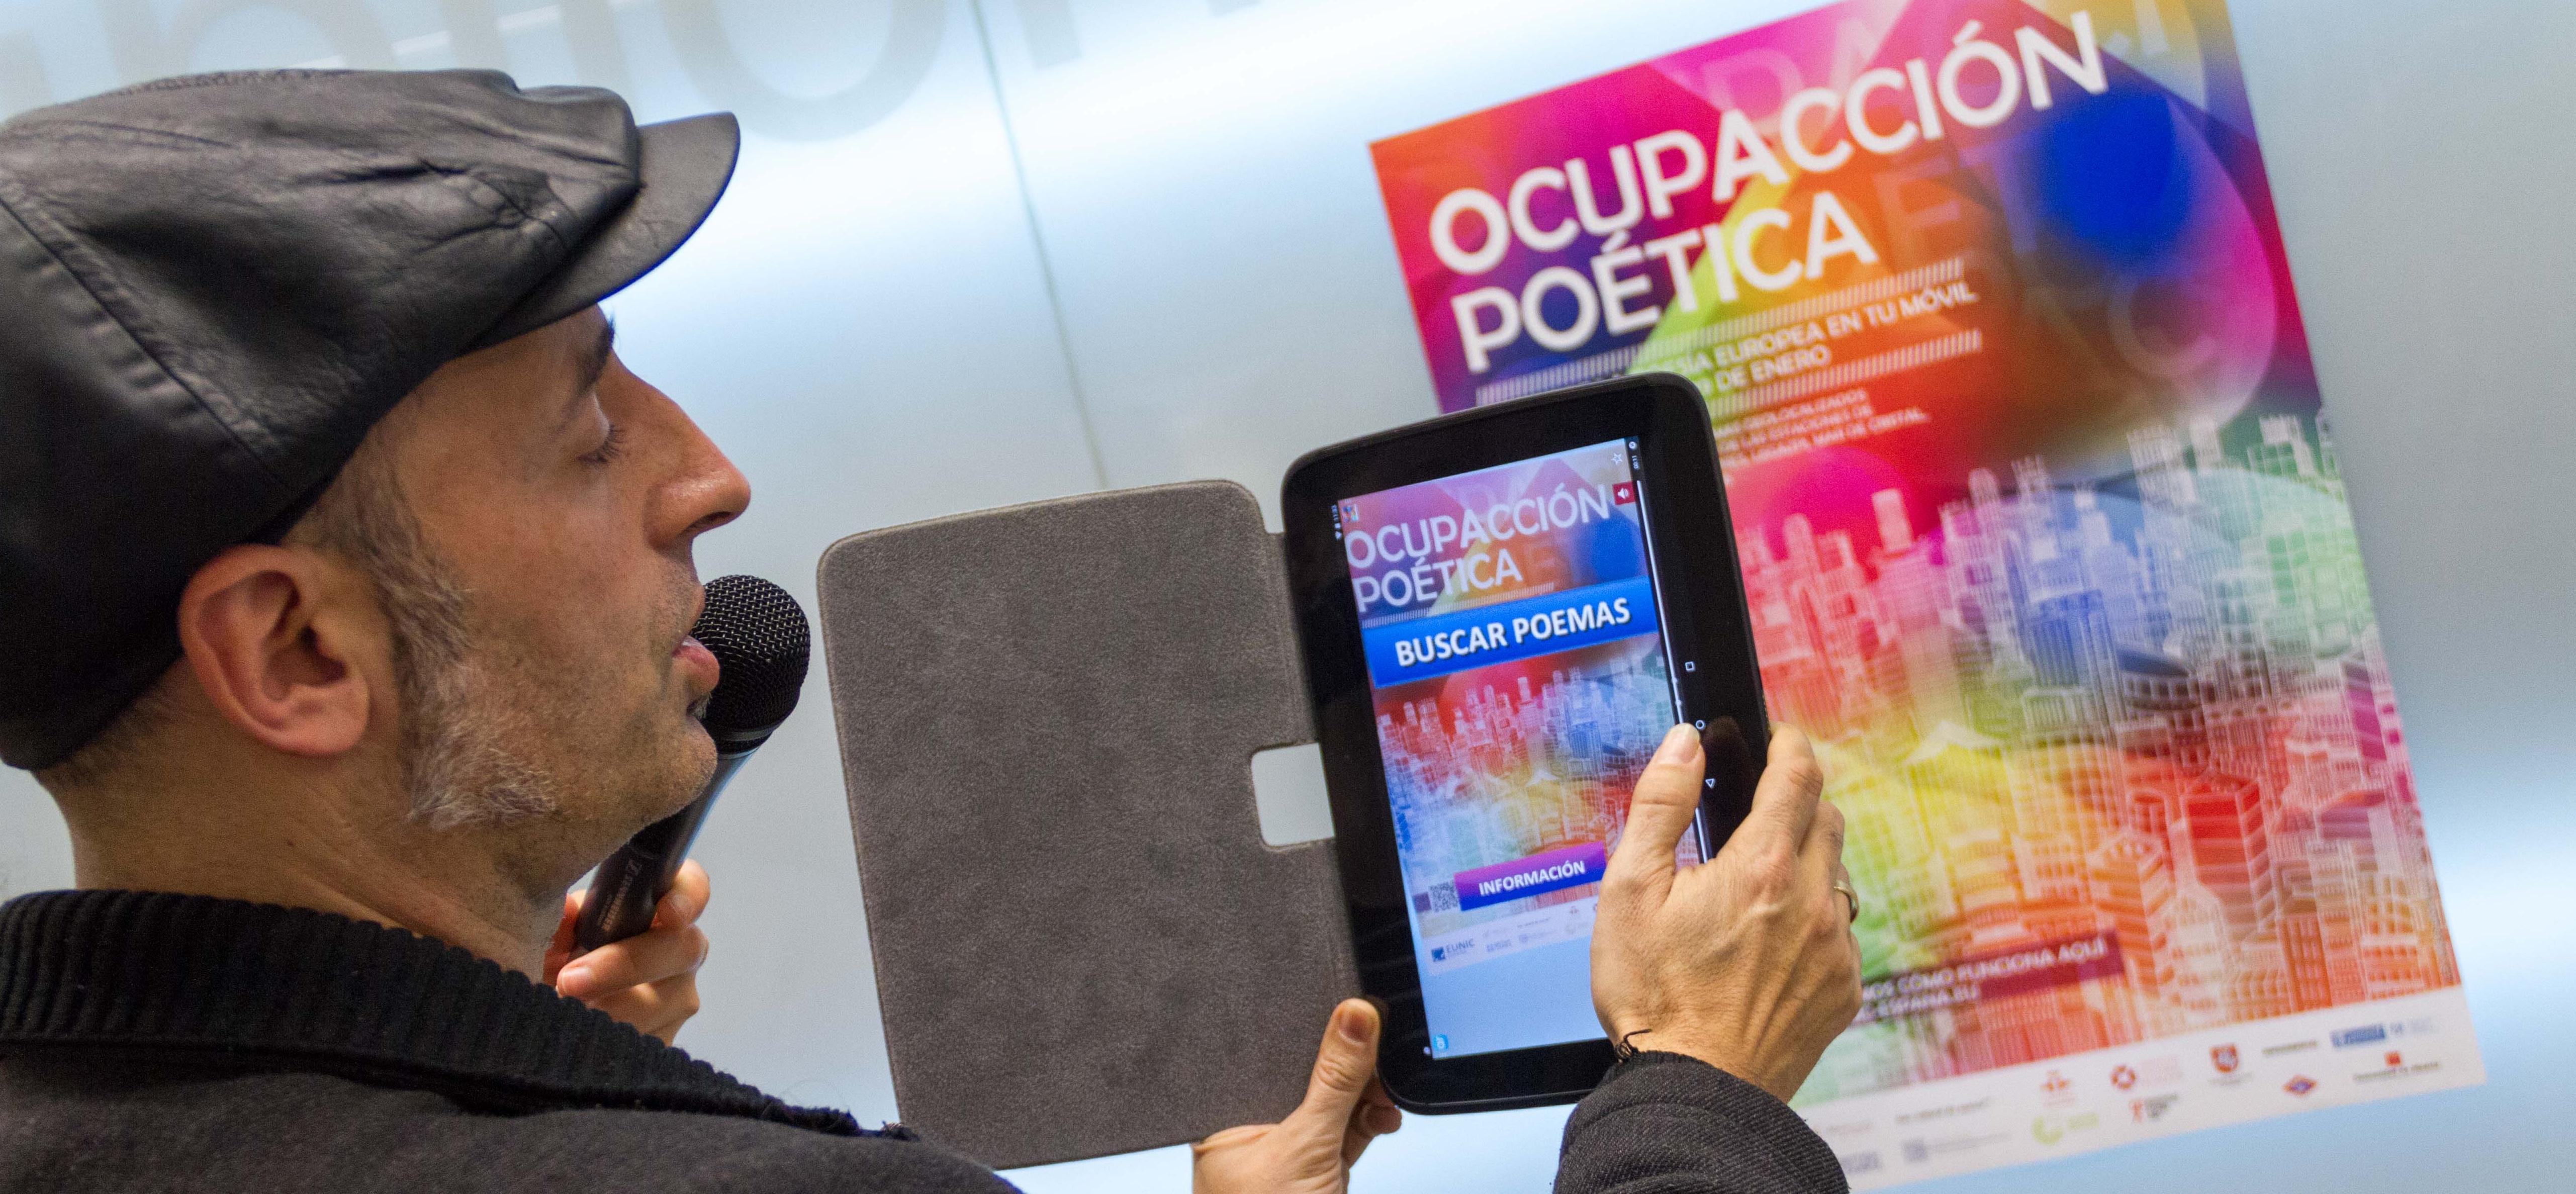 Ocupación poética - Metro Madrid